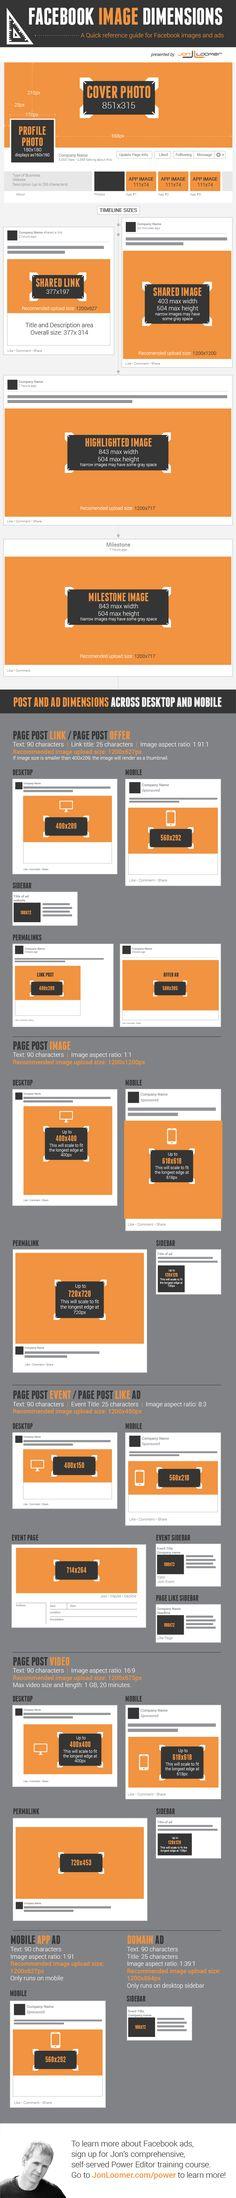 Infographic: Facebook image dimensions - via Inside Facebook